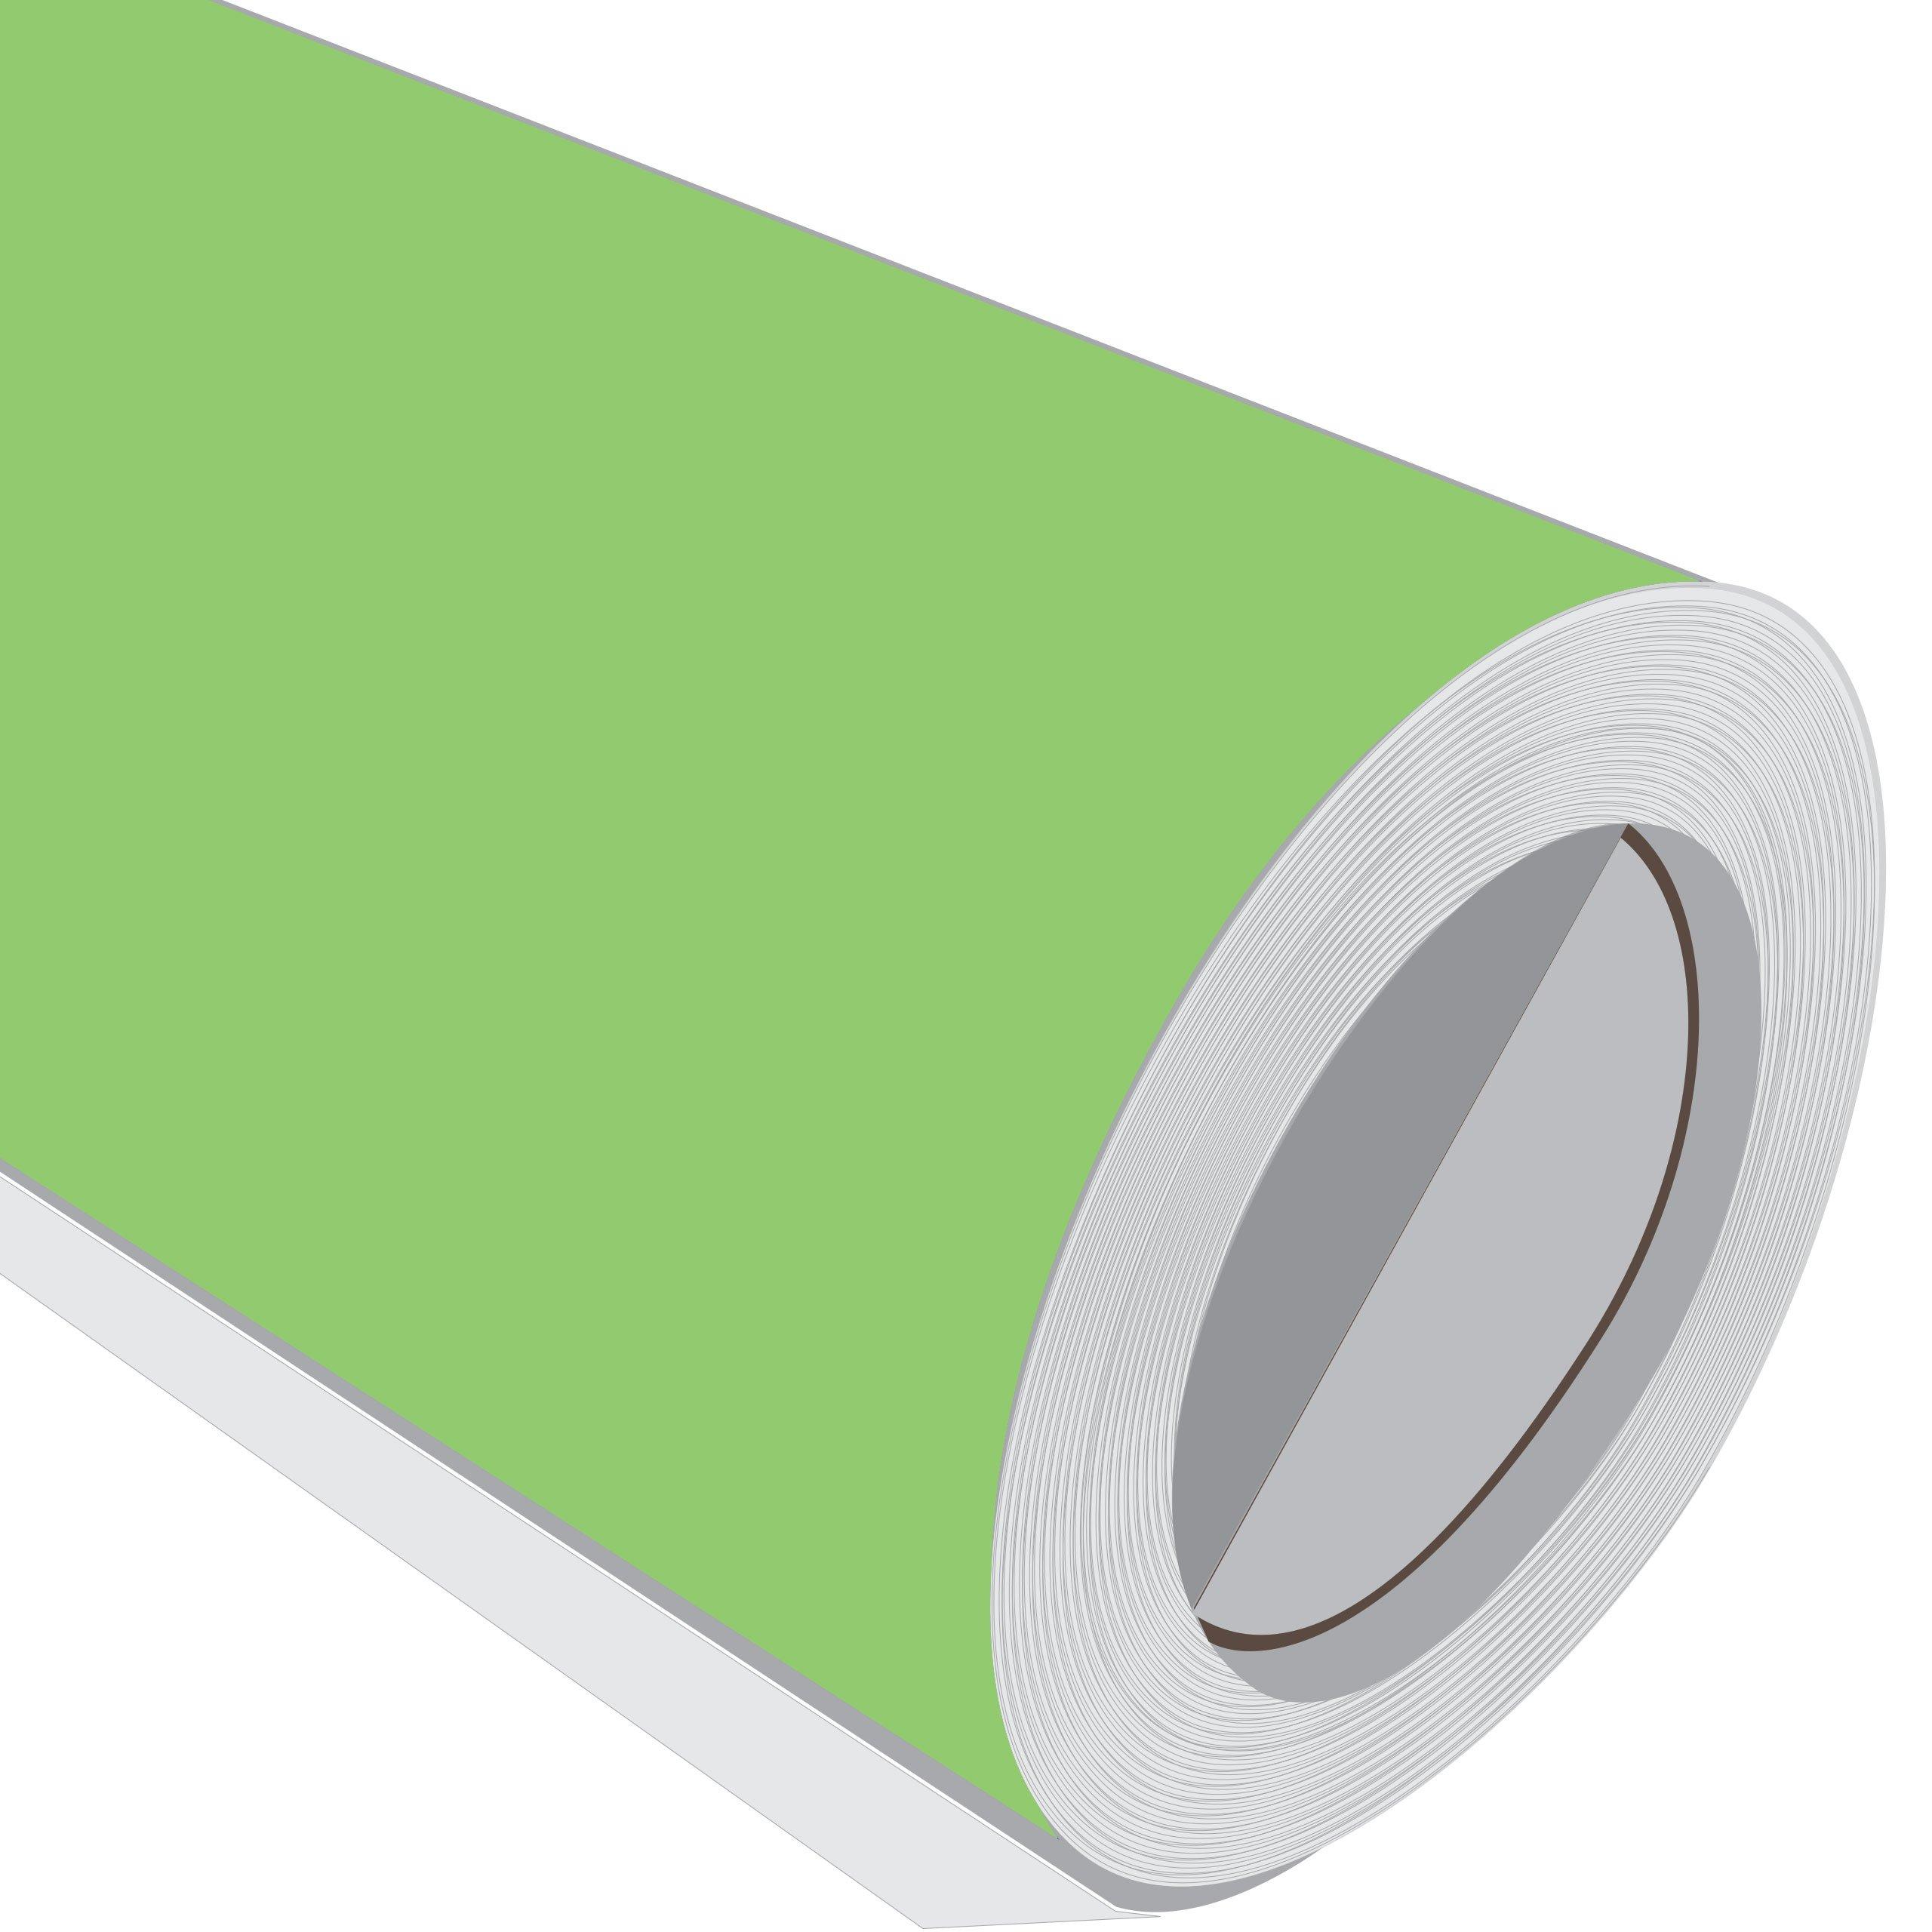 1 Metre (1 m) rollo de HD Apple verde mate 610 mm de ancho Vinilo autoadhesivo: Amazon.es: Hogar